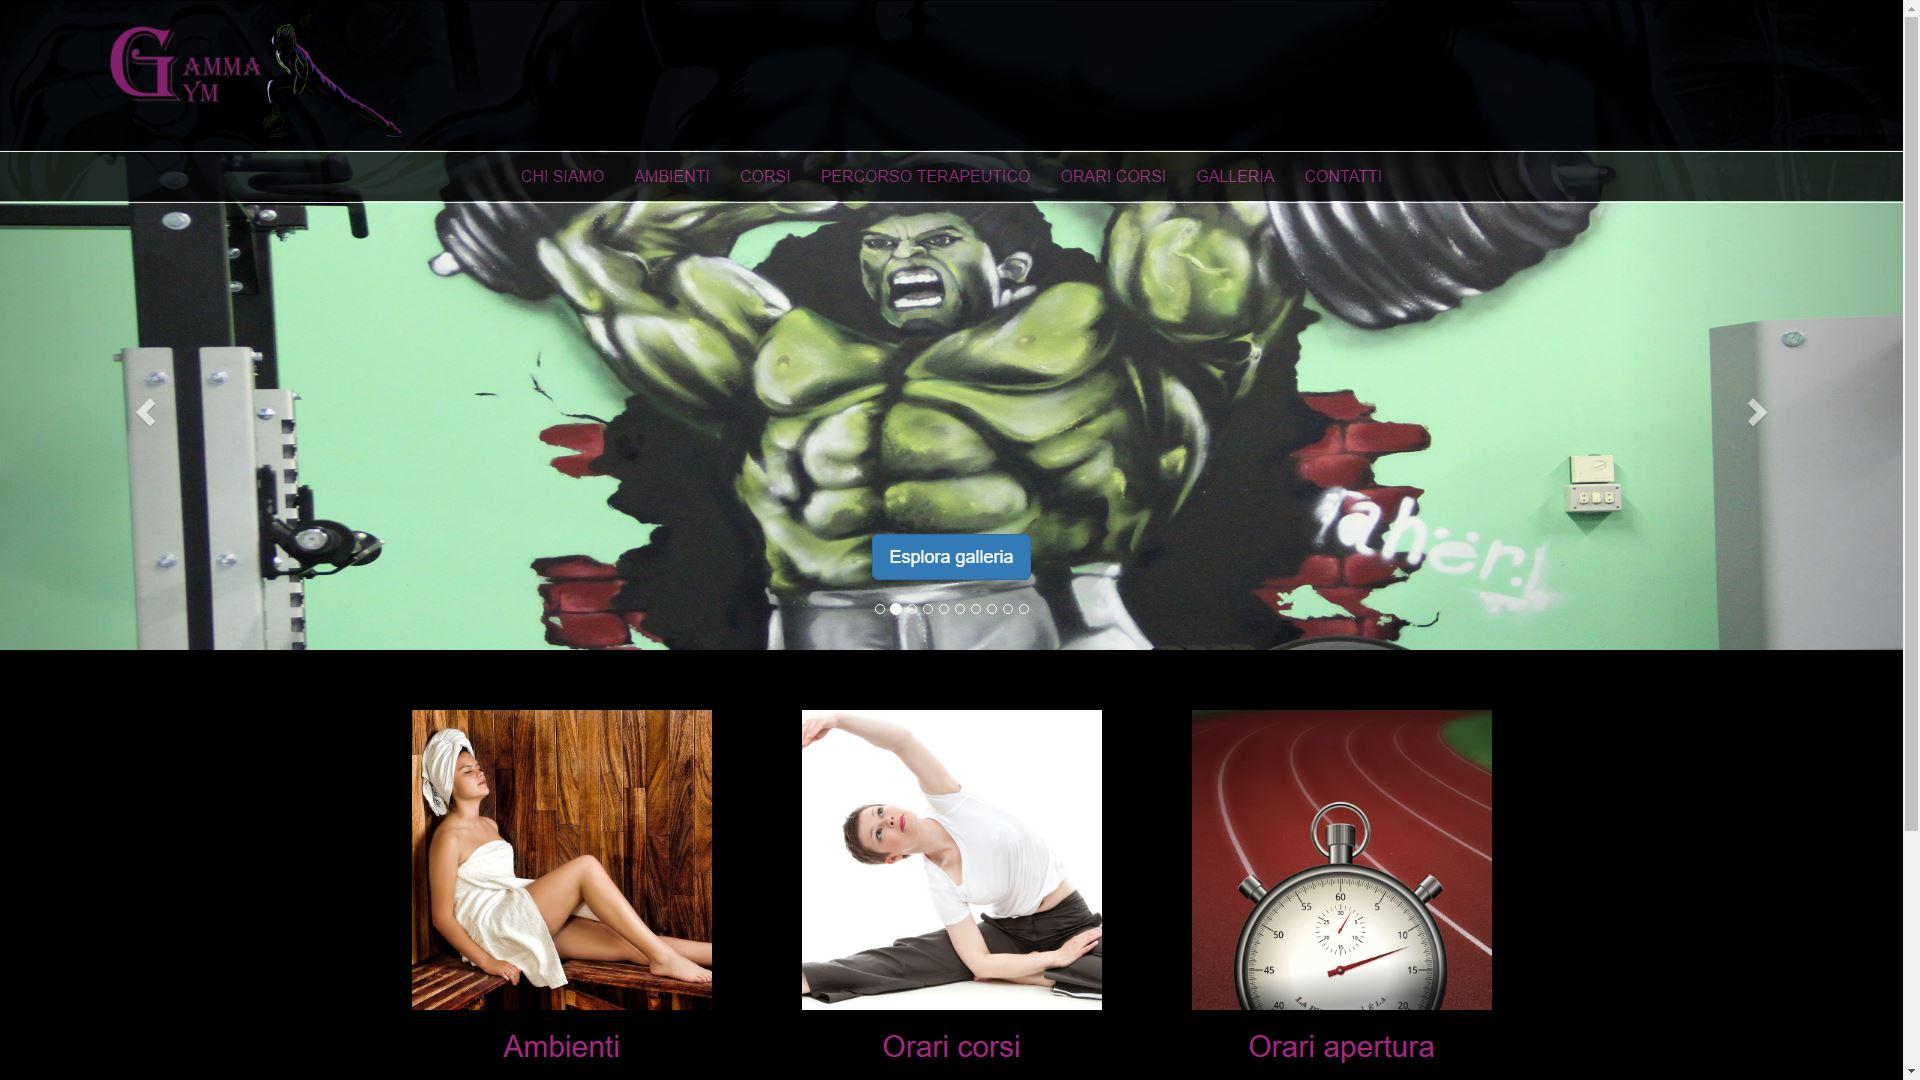 Mk Computers - Assistenza PC e Siti Web Caselle Torinese - Gamma Gym Home Page